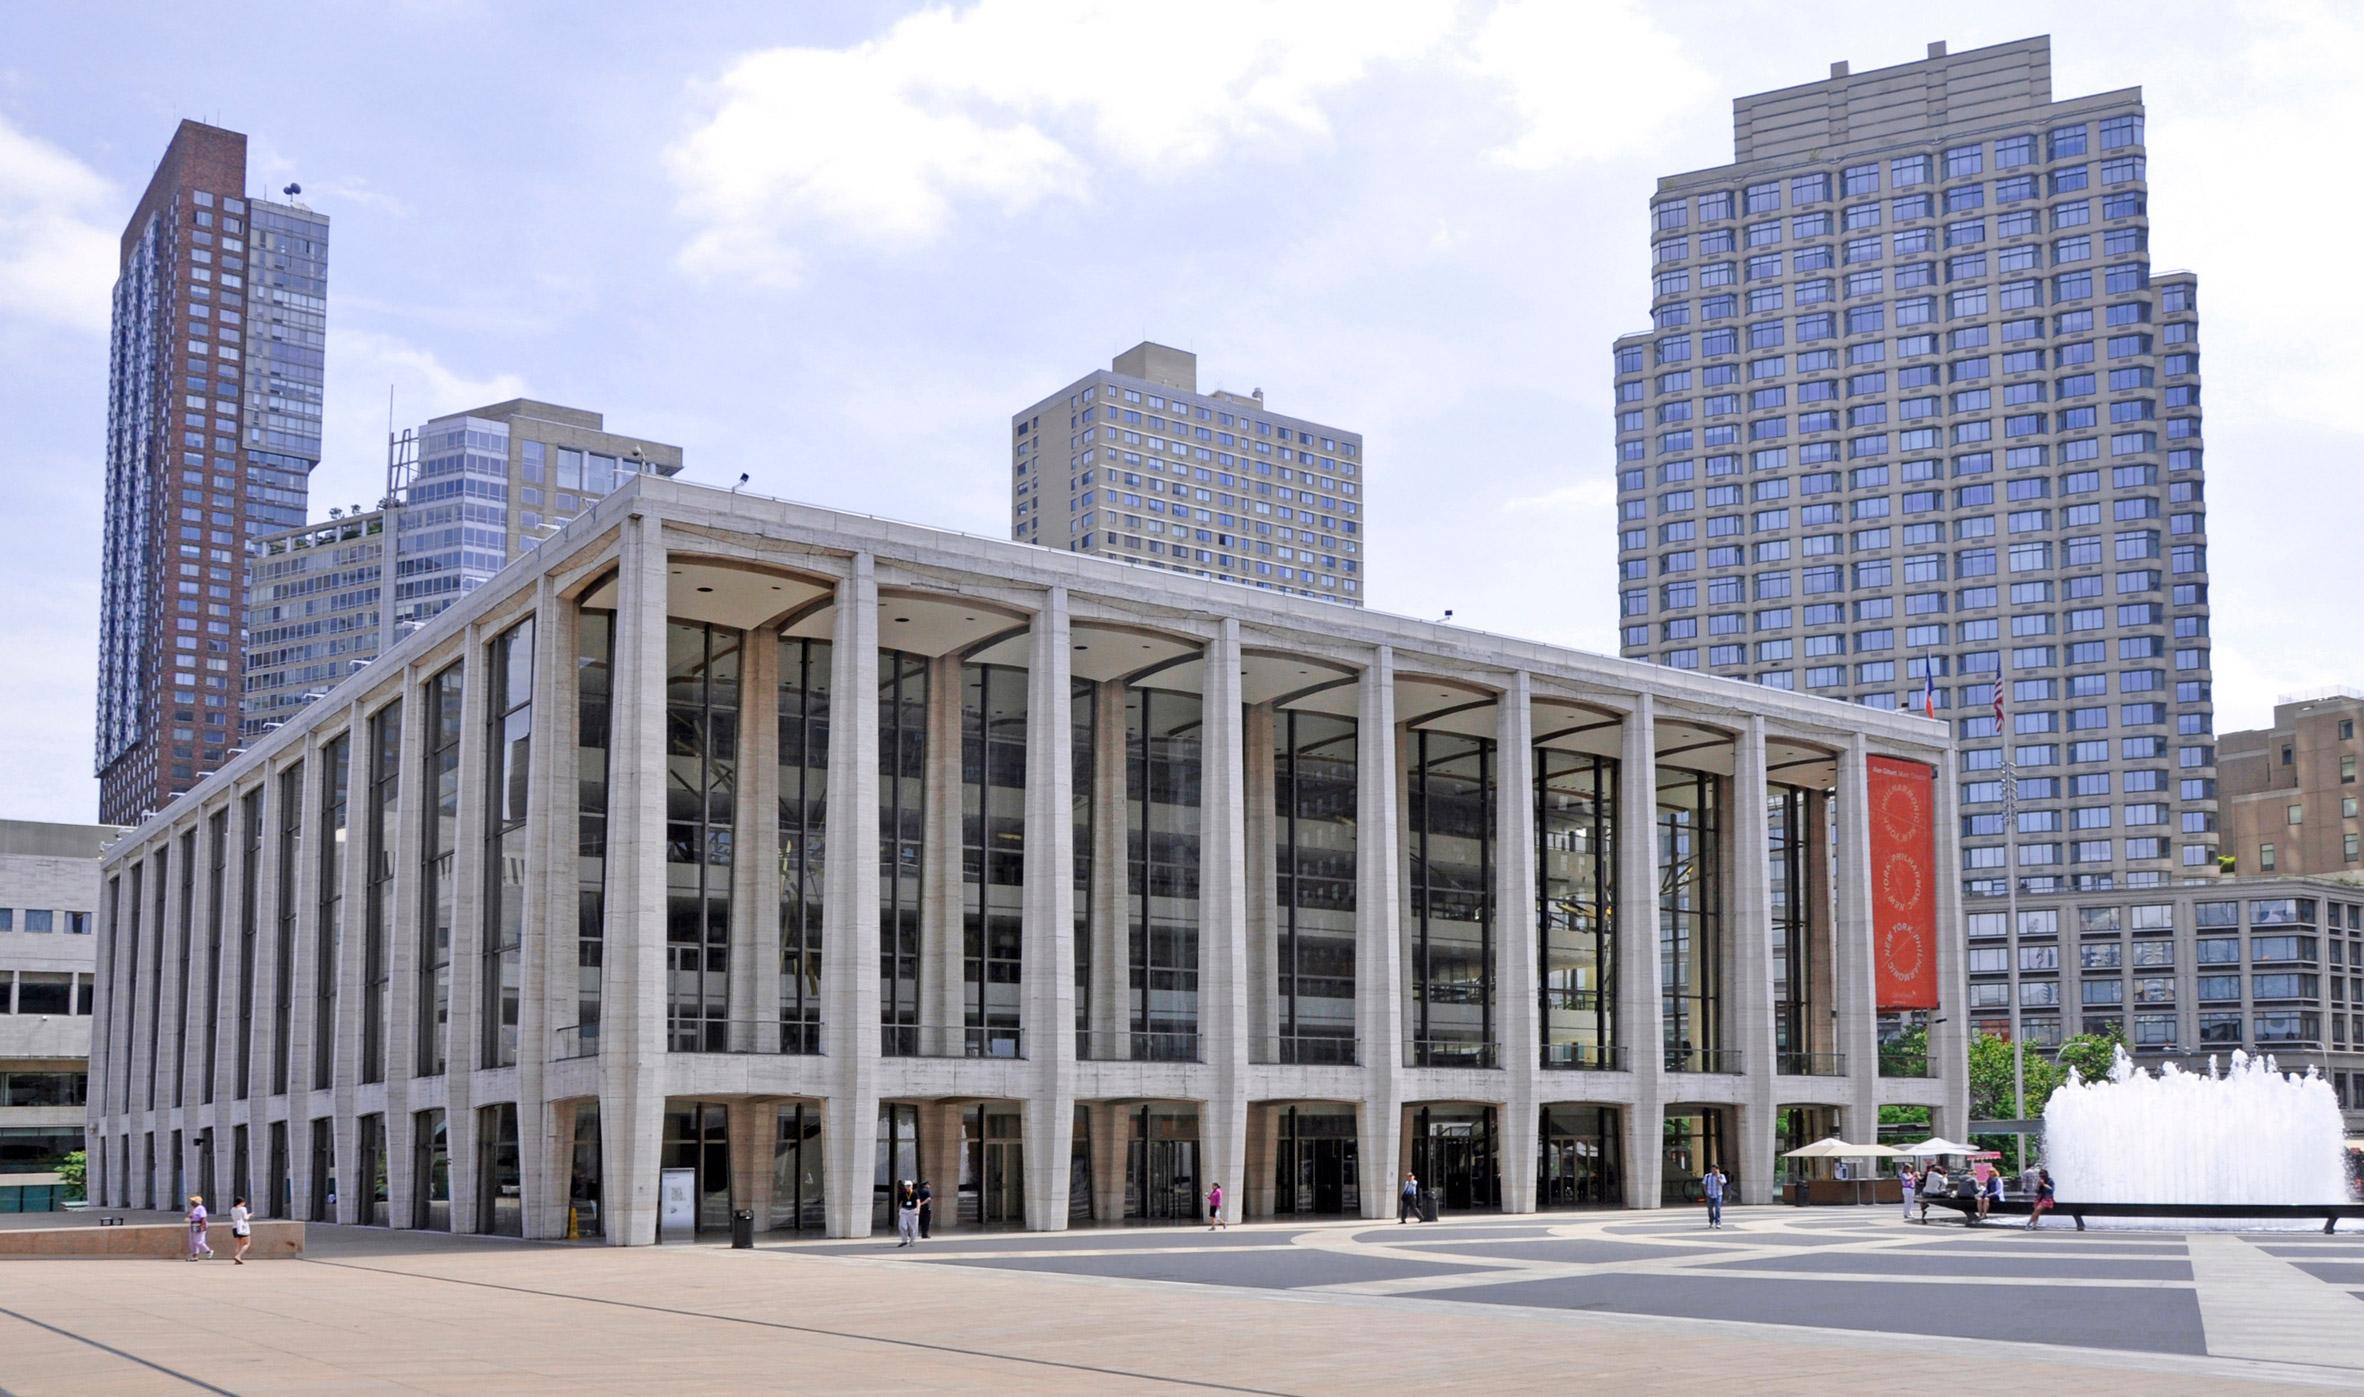 Heatherwick's overhaul of New York Philharmonic concert hall scrapped